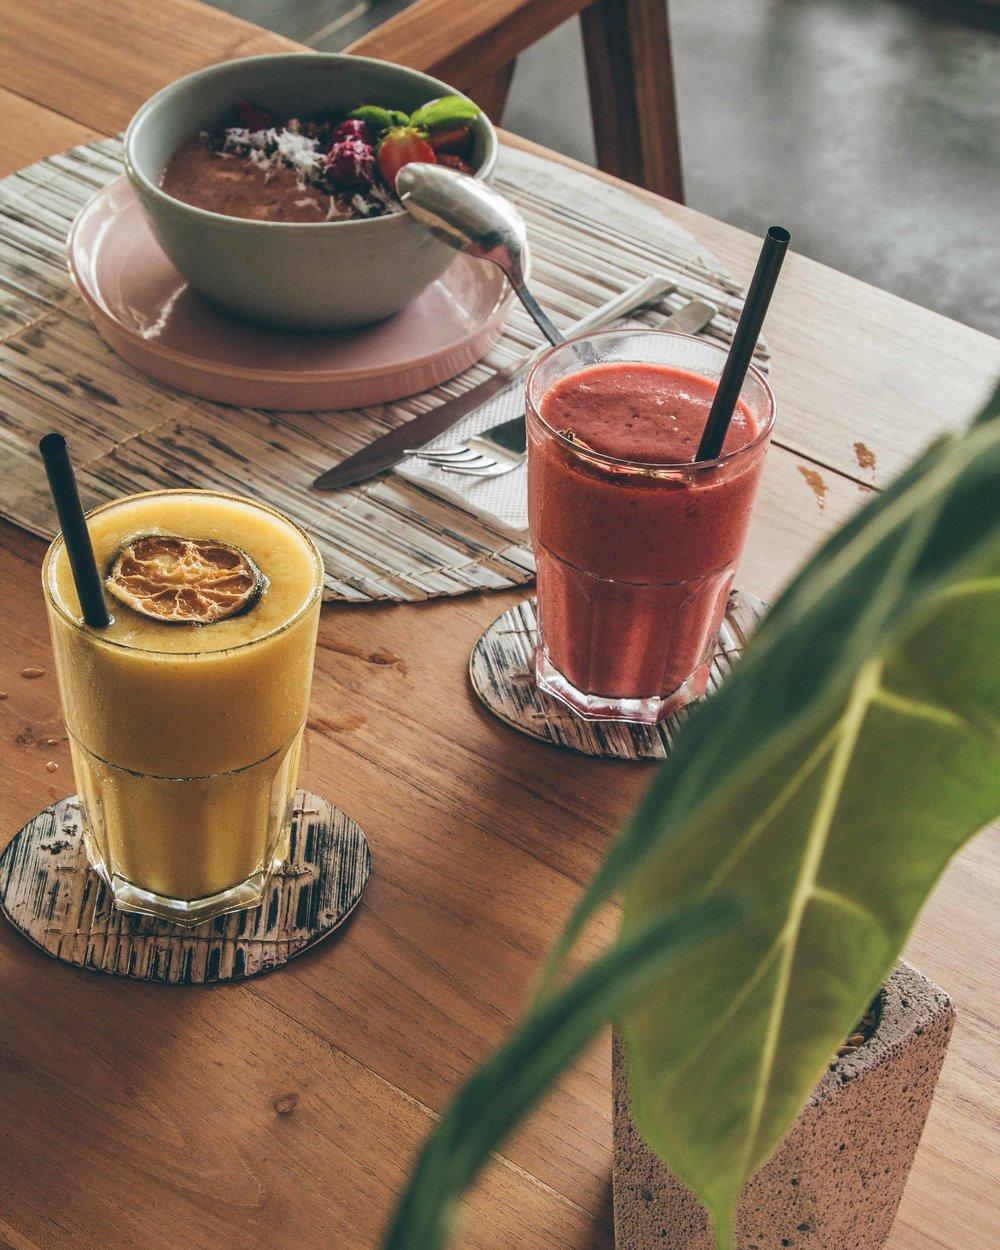 delicious vegan food breakfast smoothies fruit vegan vegetarian option best canggu bali missibu bali